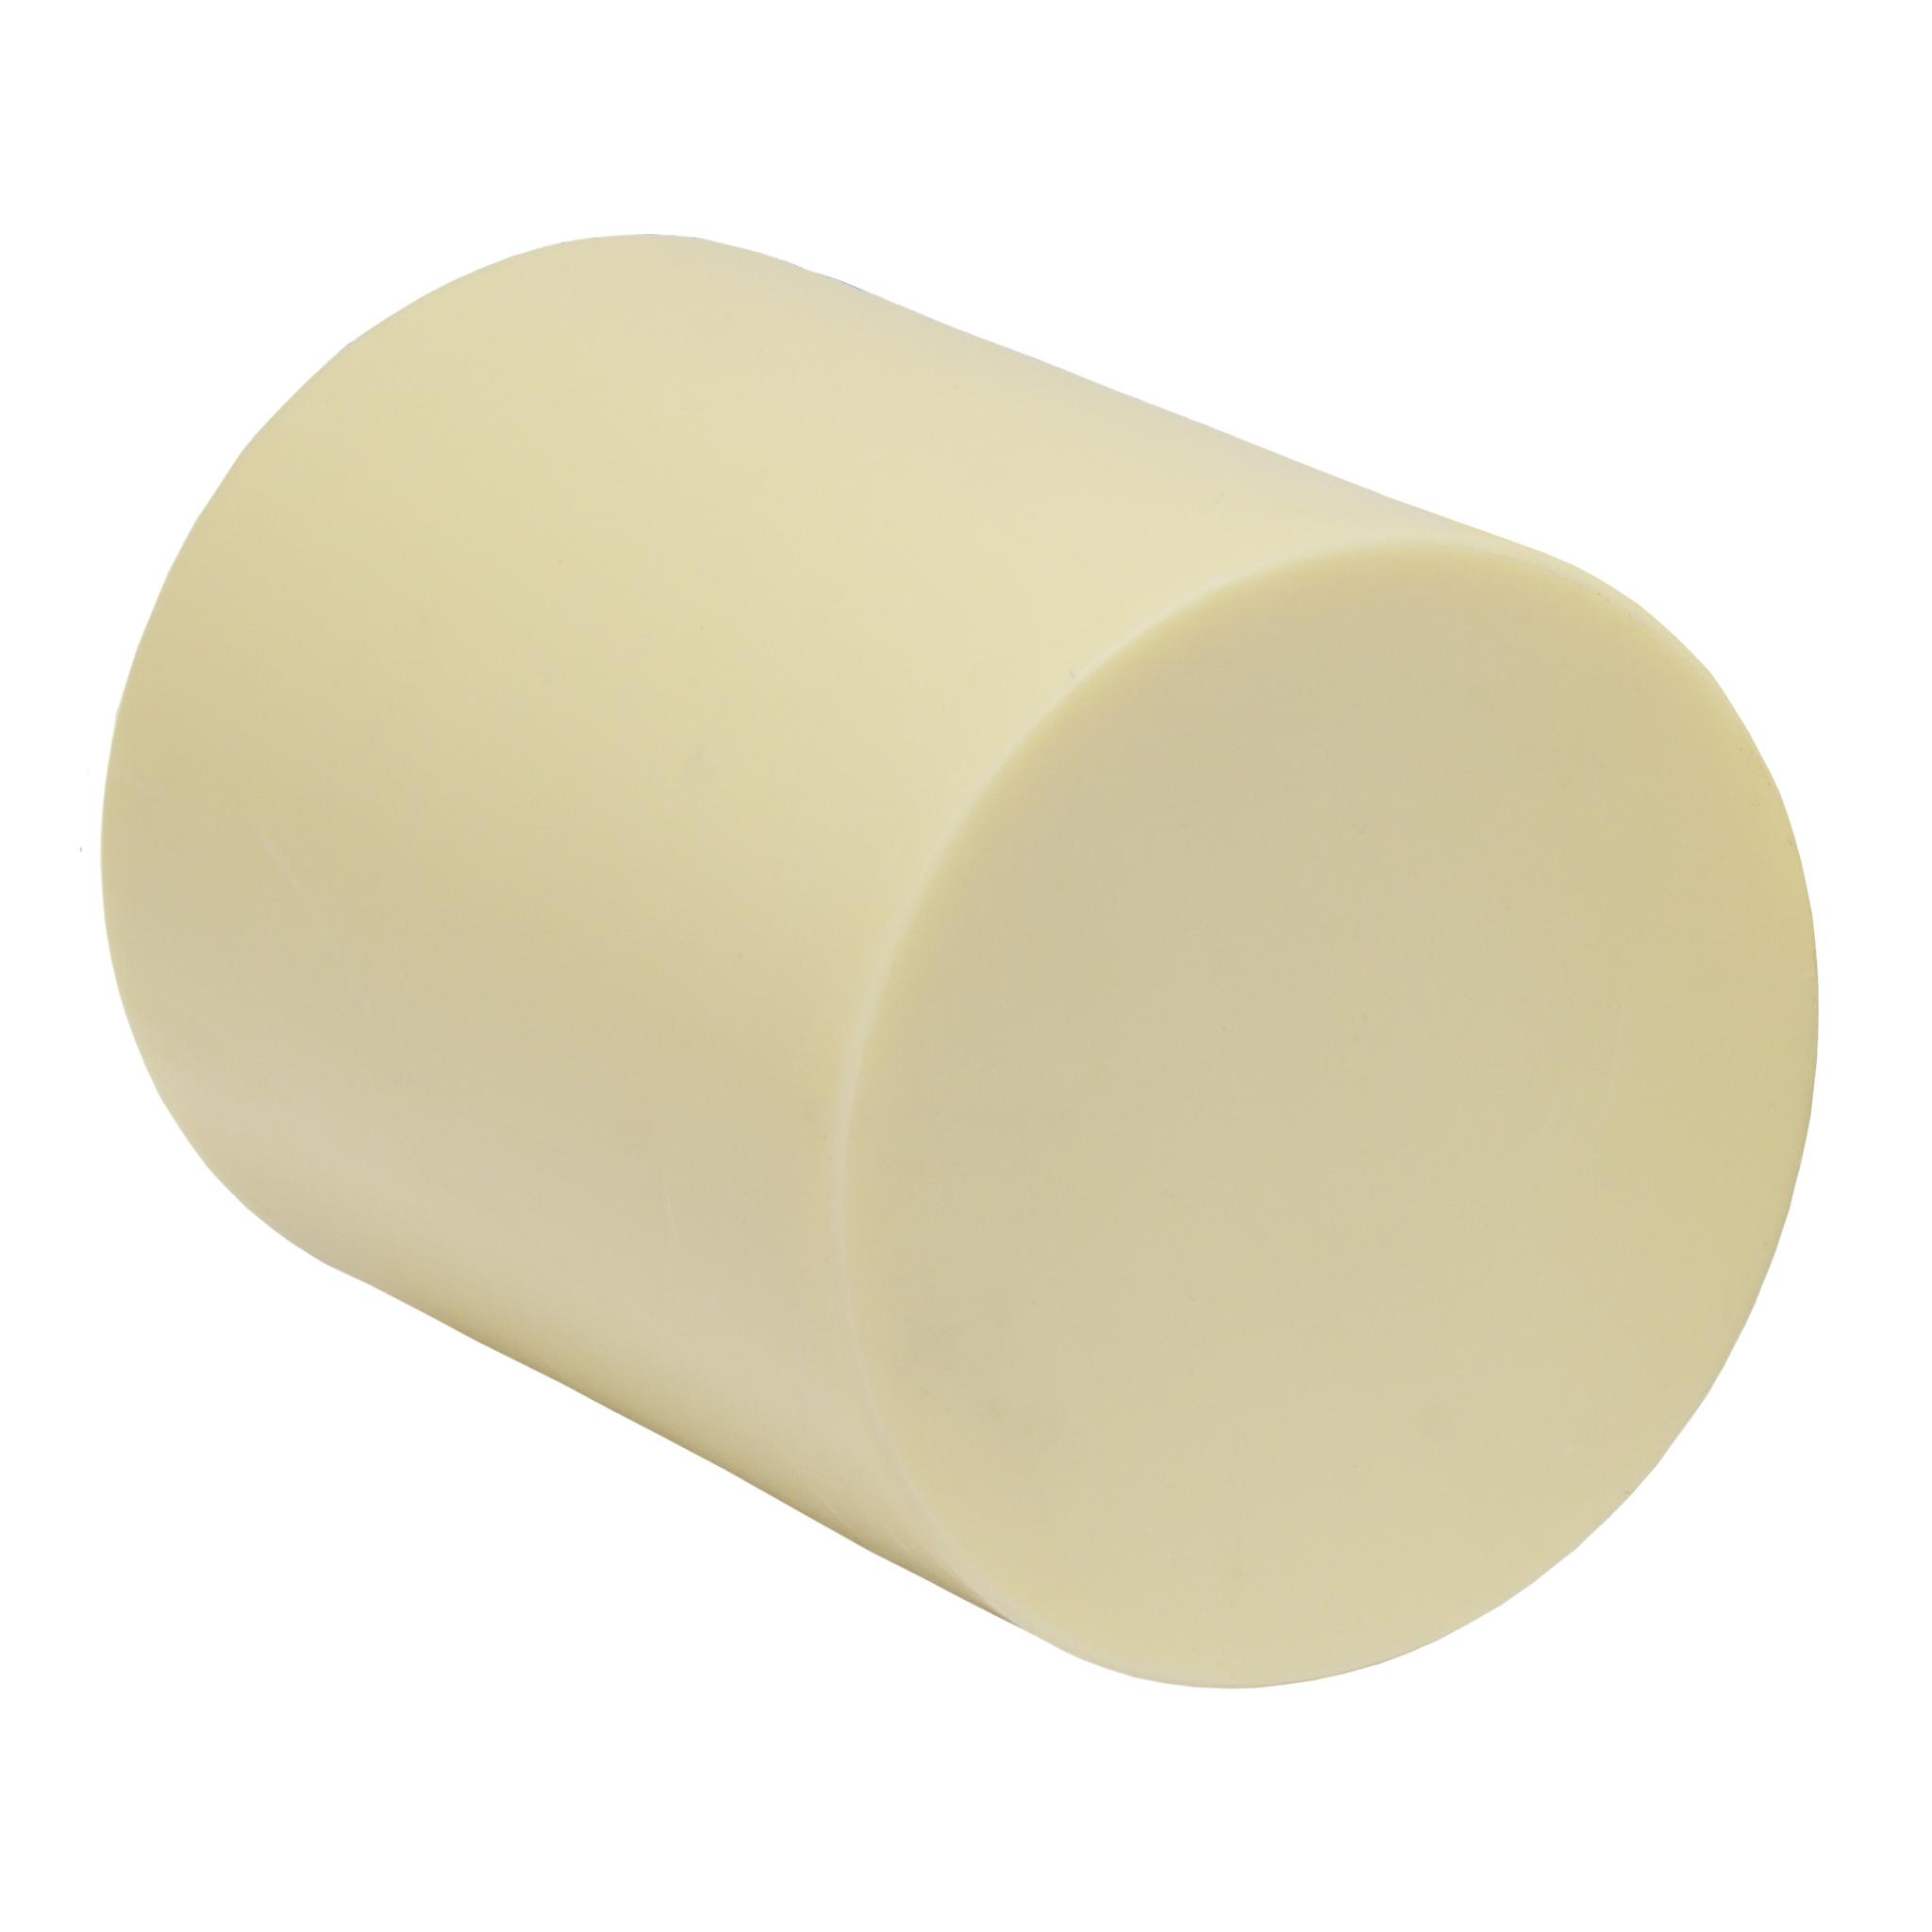 HRANITHERM 603.00 Transparent - EVA Hot Melt Cartridge